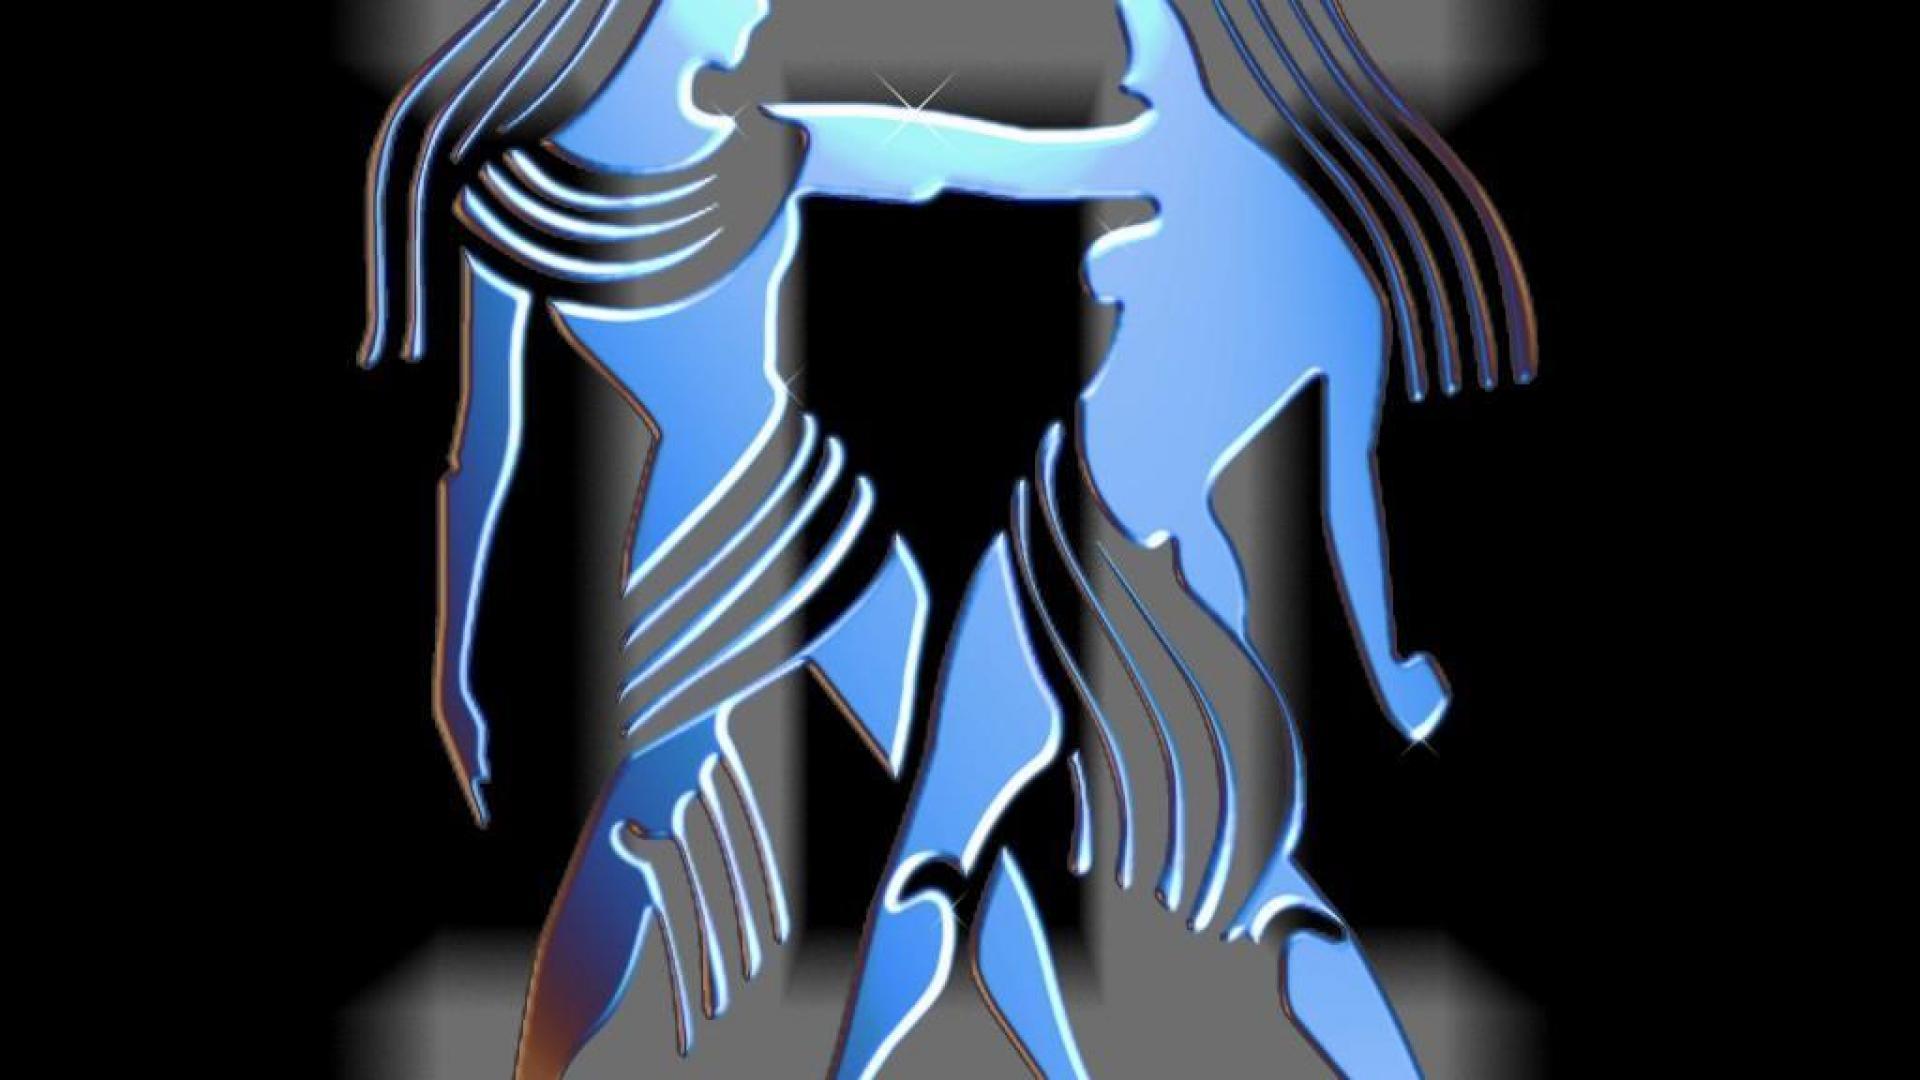 gemmeni zodiac hd wallpaper wallpapers55com   Best Wallpapers for 1920x1080